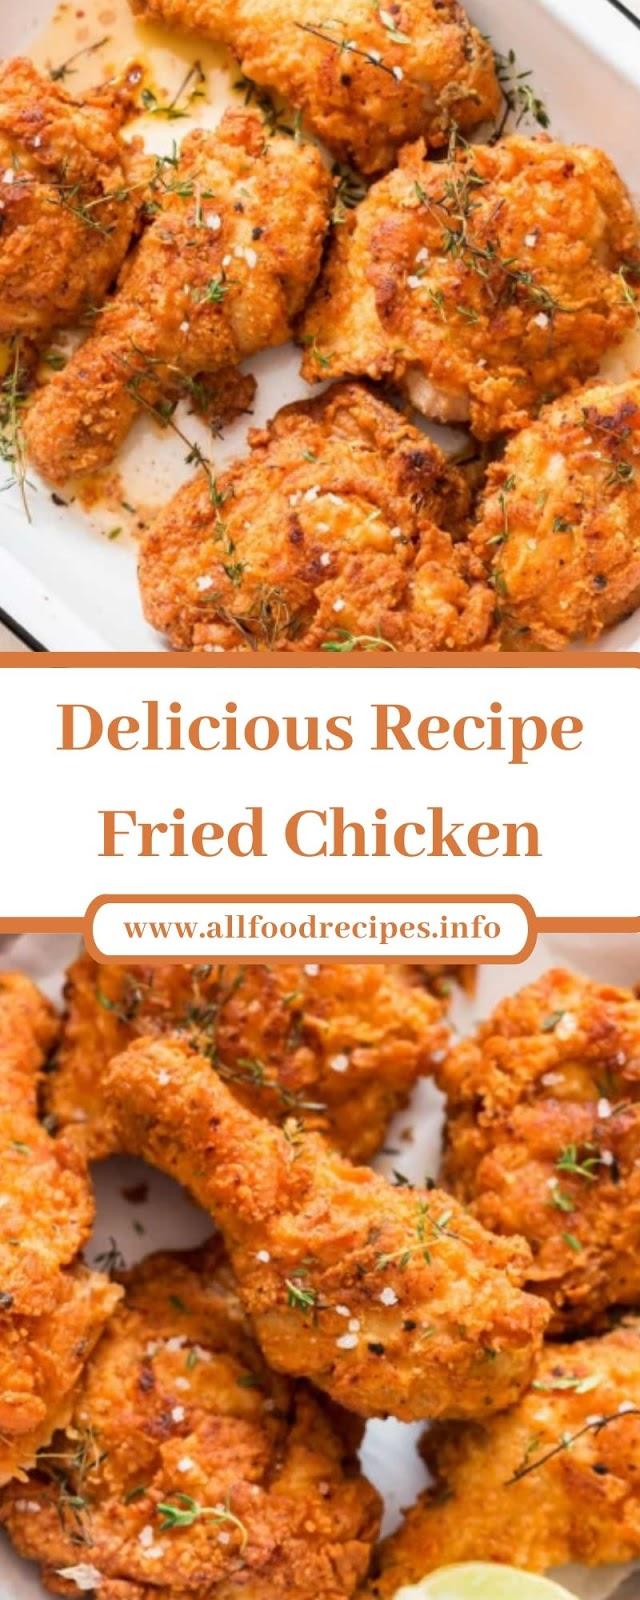 Delicious Recipe Fried Chicken